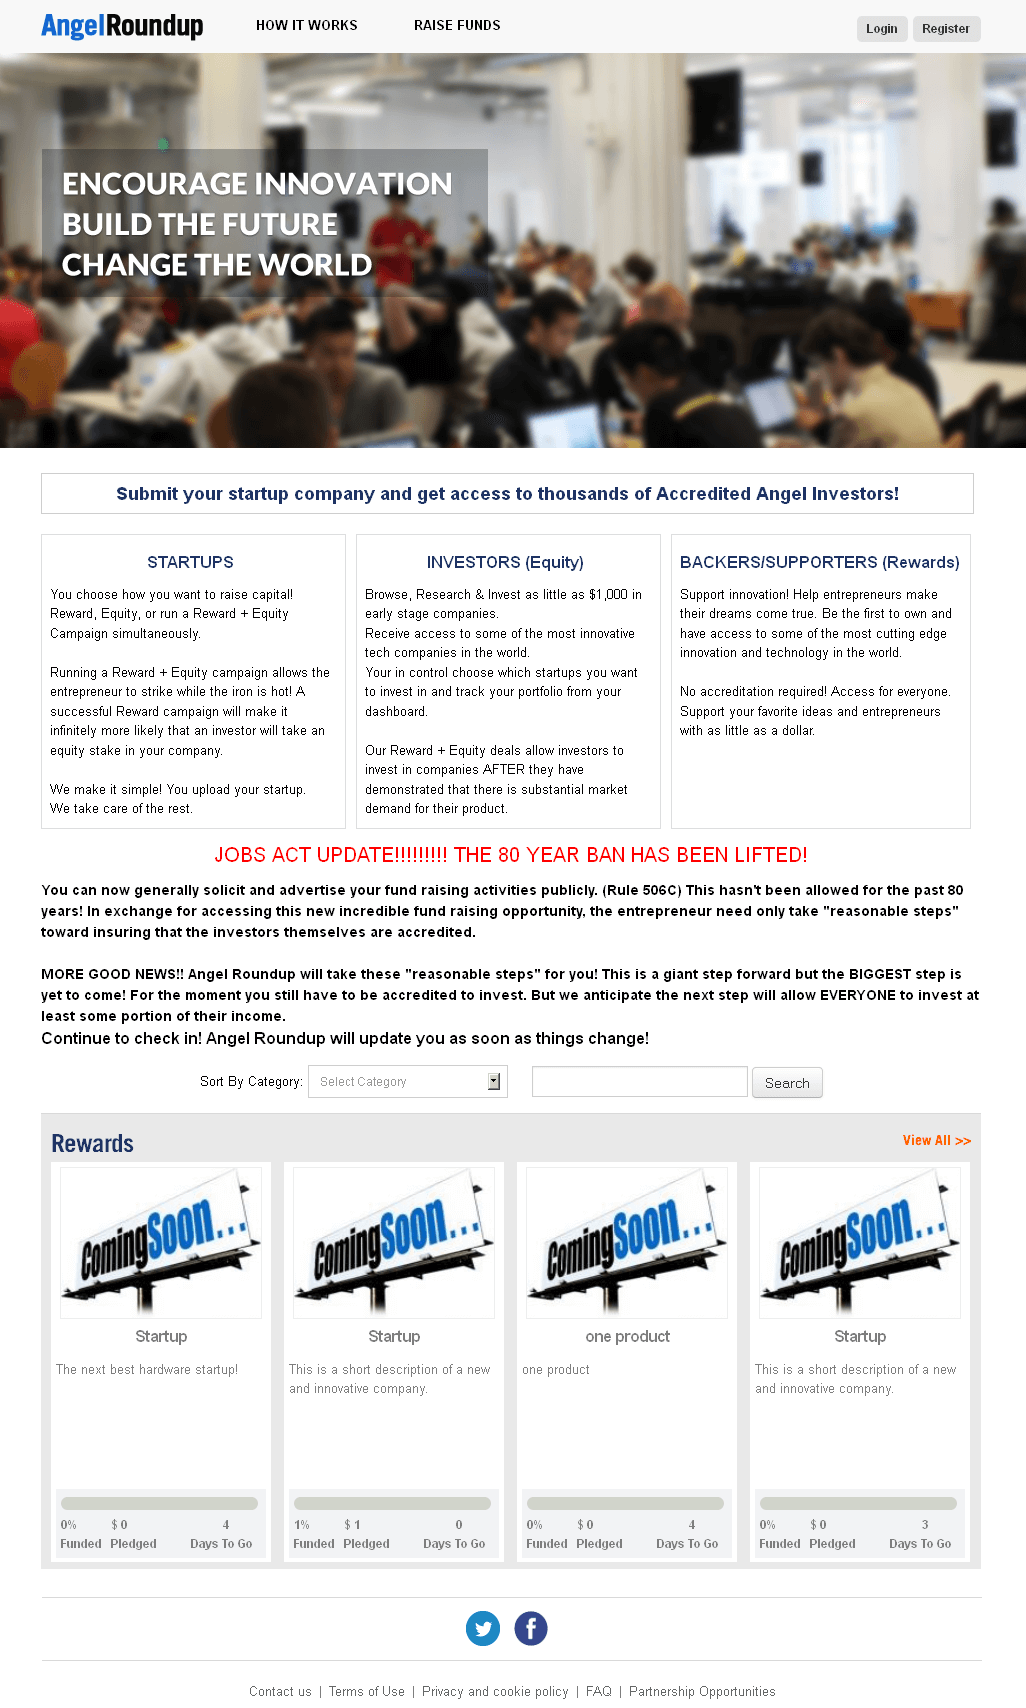 Development of a Crowd Funding Website